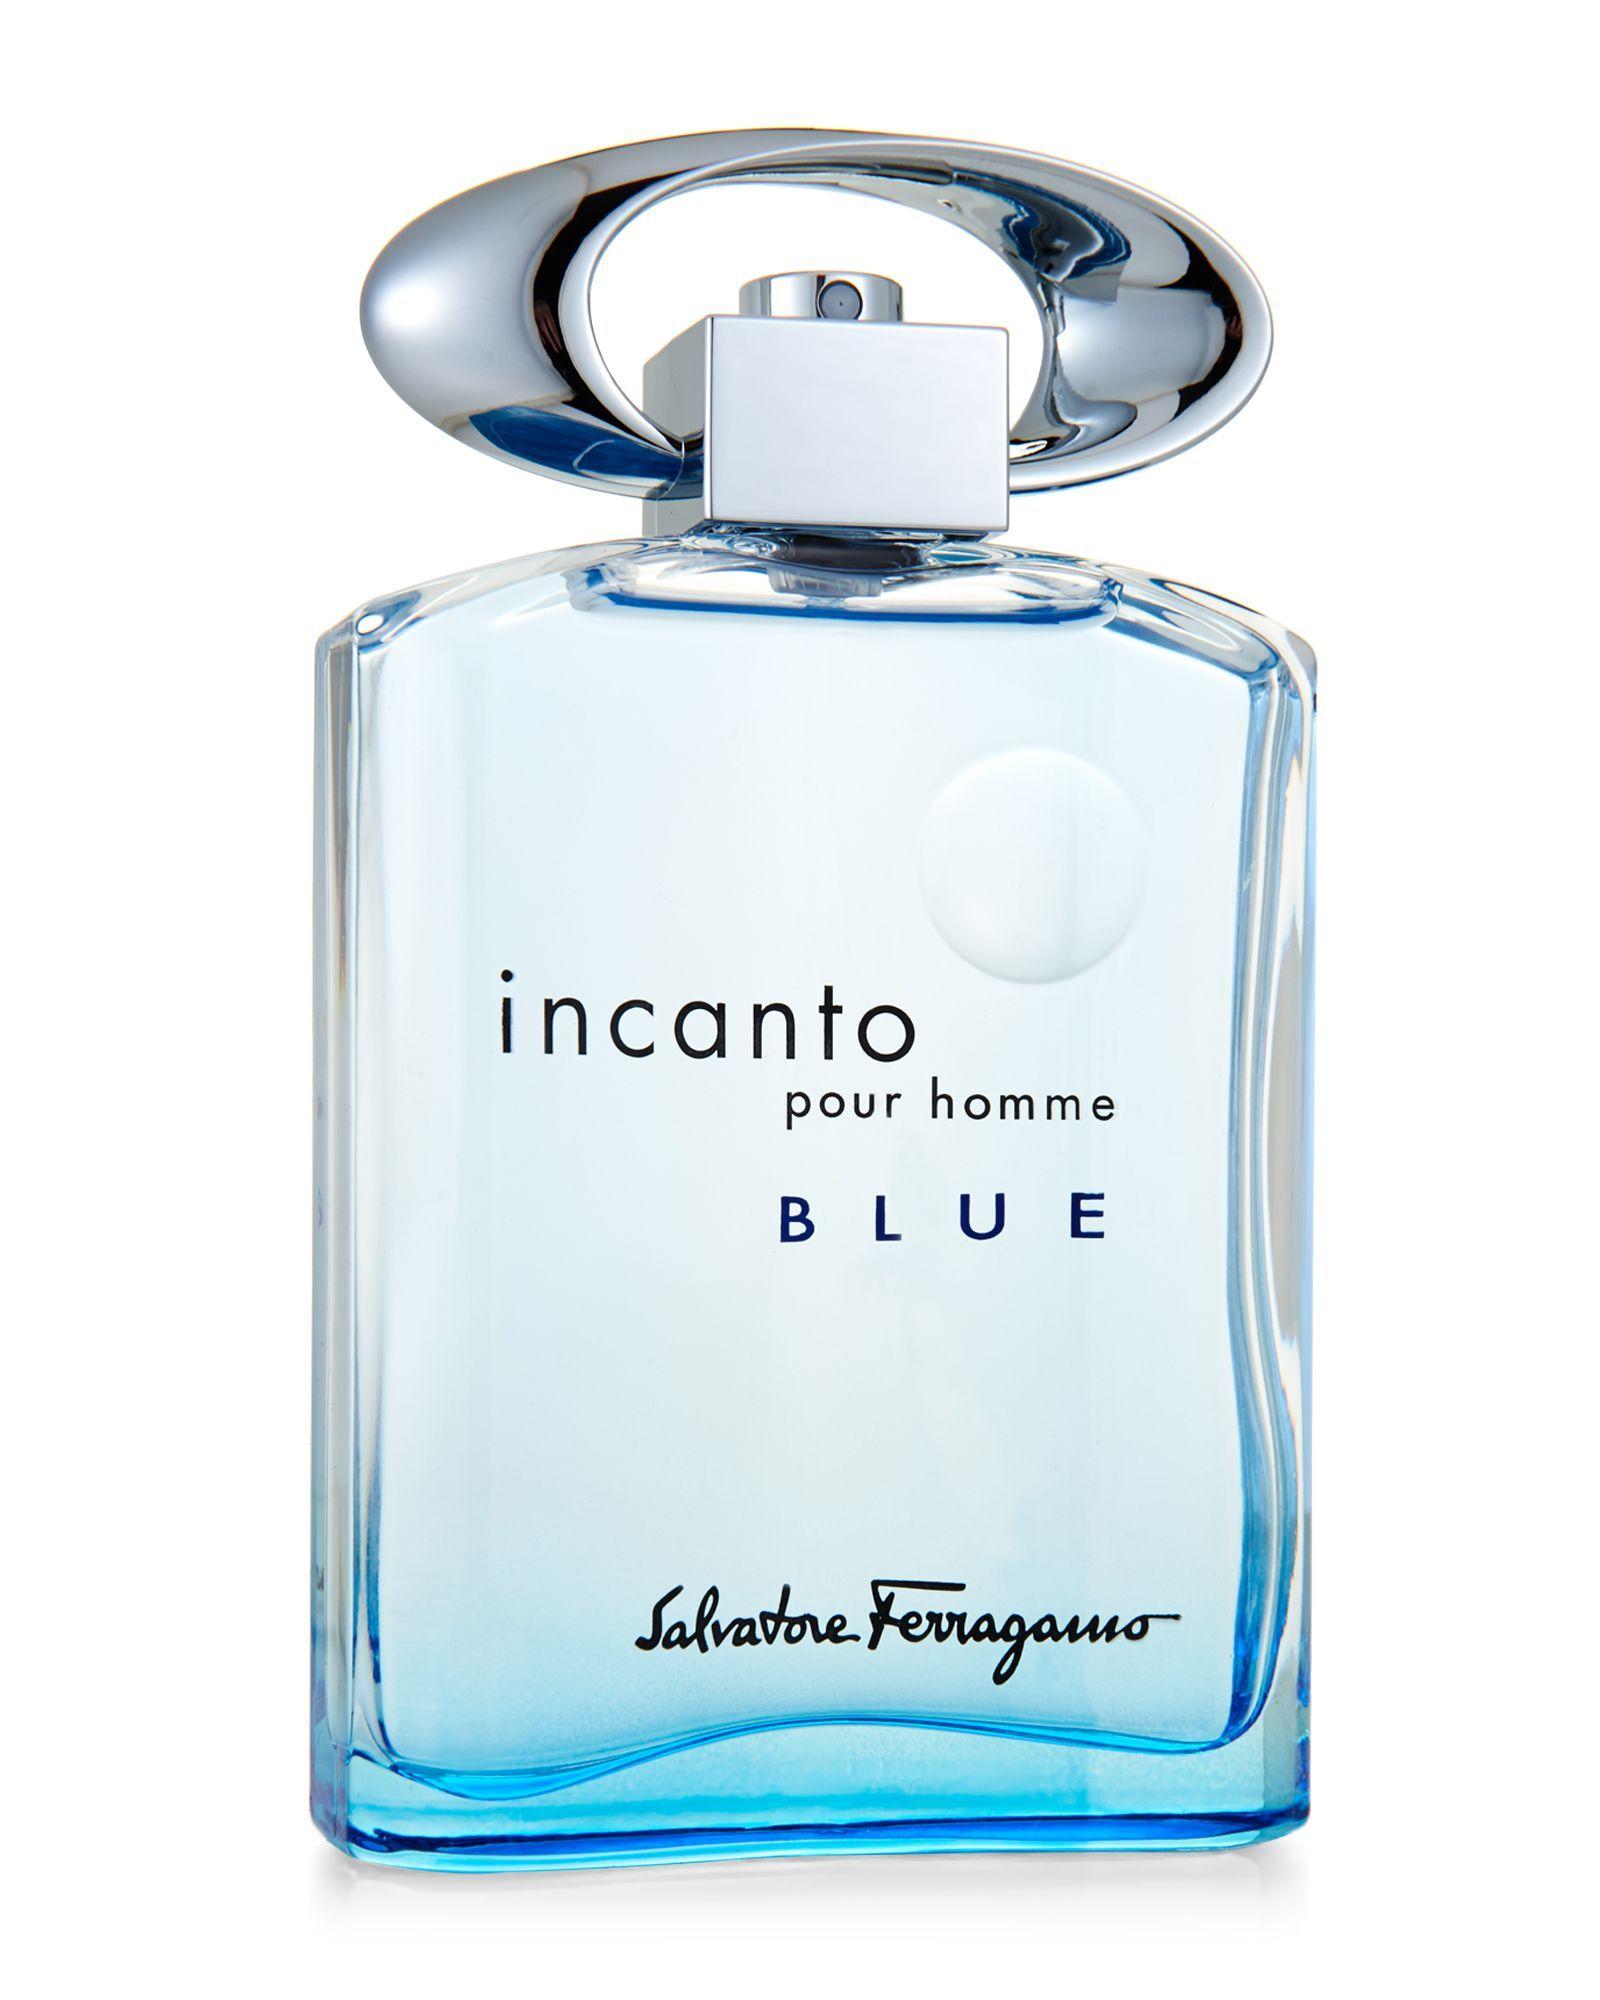 Ferragamo Blue Perfumemensalvatoreferragamo Blue Salvatore Incanto Incanto Perfumemensalvatoreferragamo Salvatore Ferragamo toQrdCxBsh